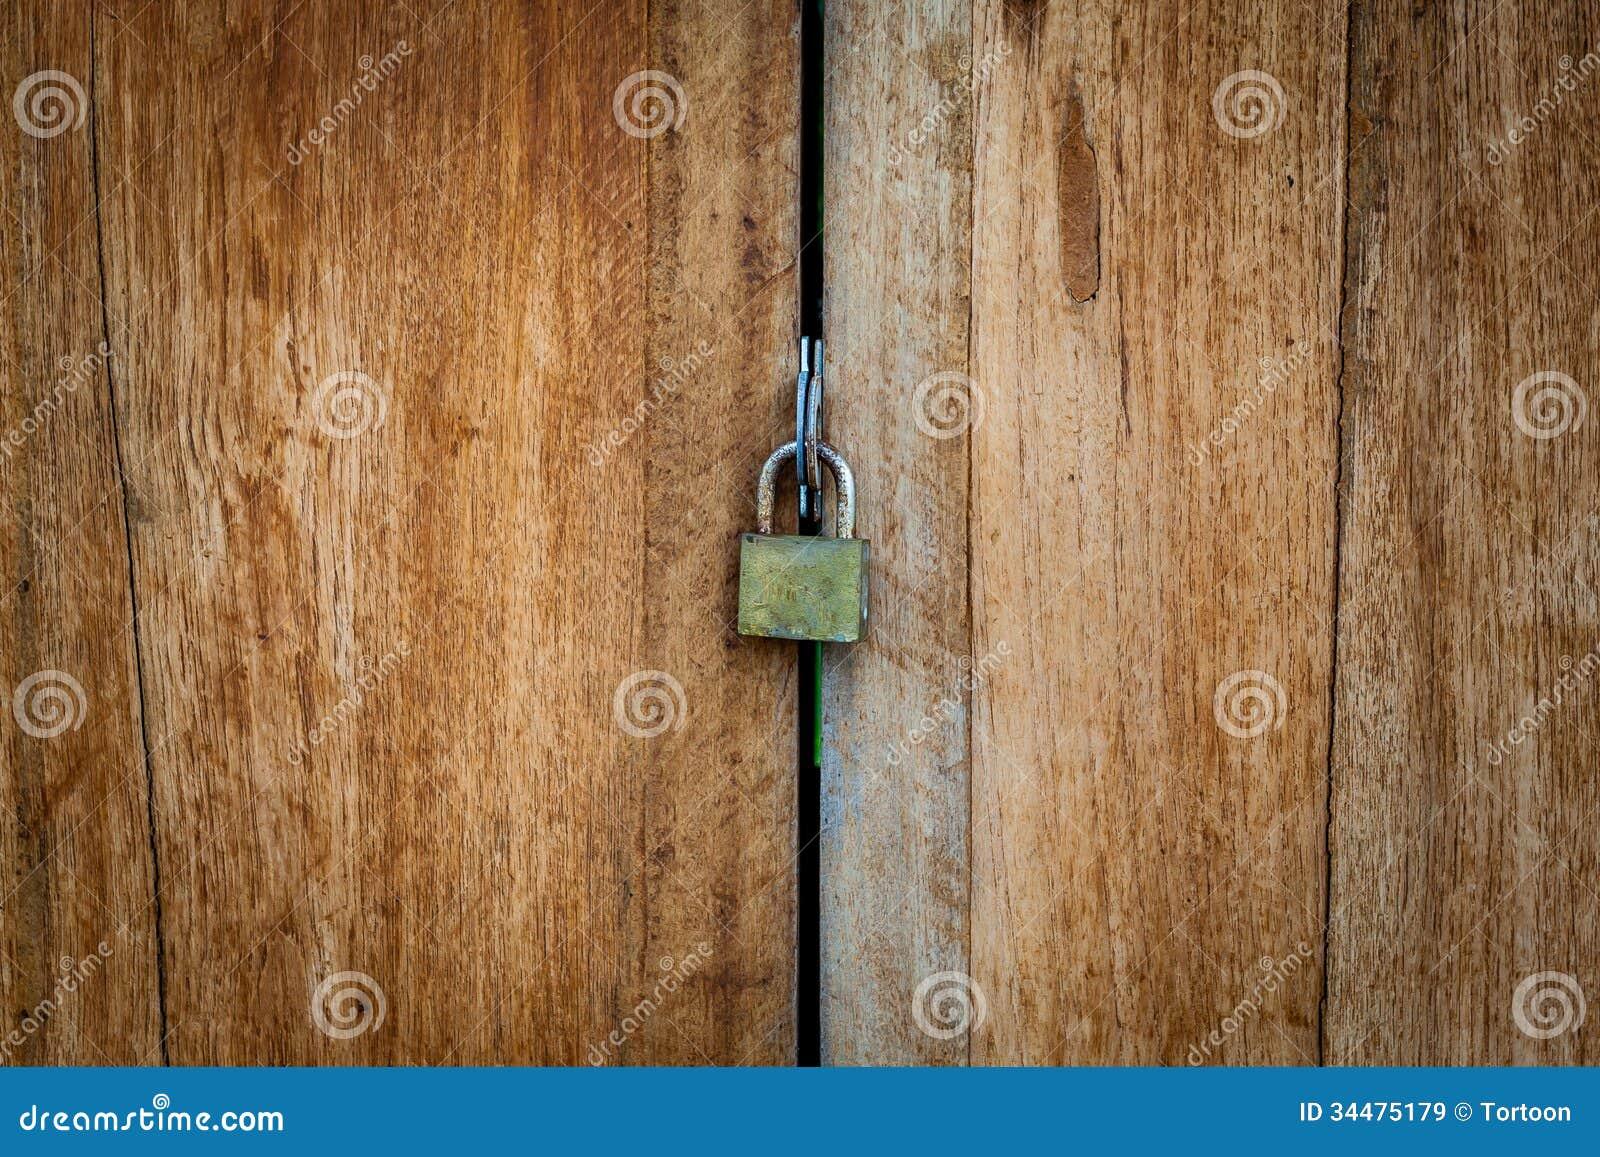 Vieille serrure porte